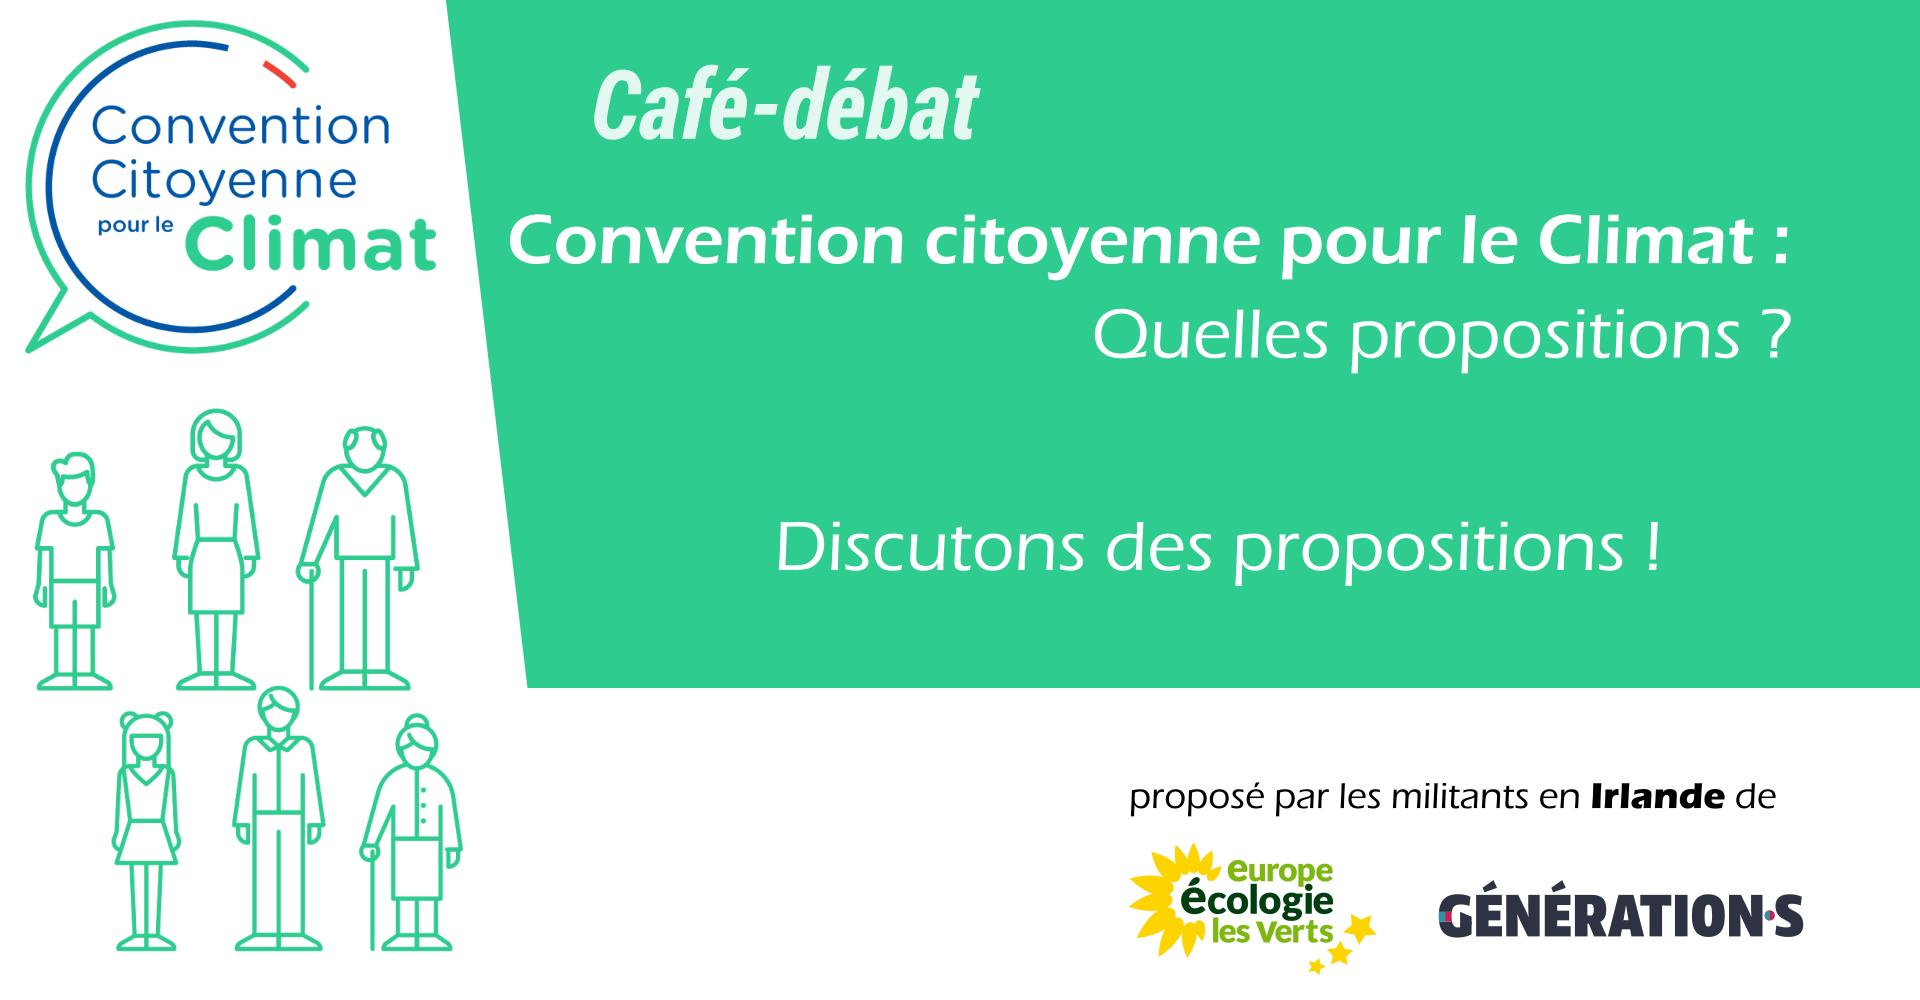 Visuel_cafeDebat_CCC_propositions_logosPartis